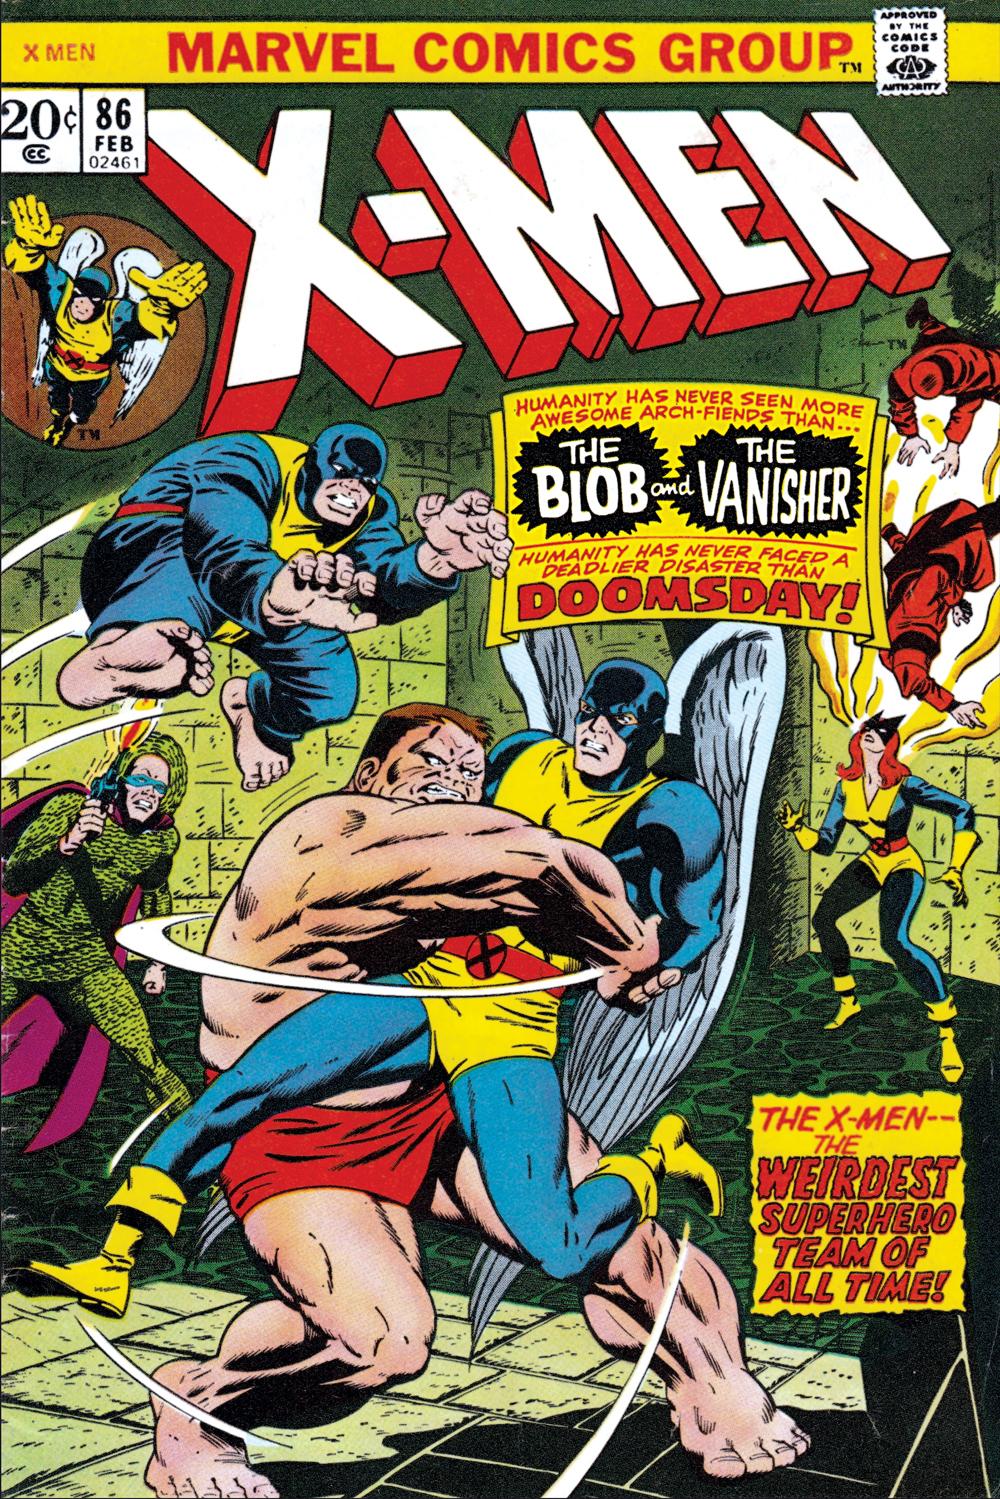 Uncanny X-Men (1963) #86